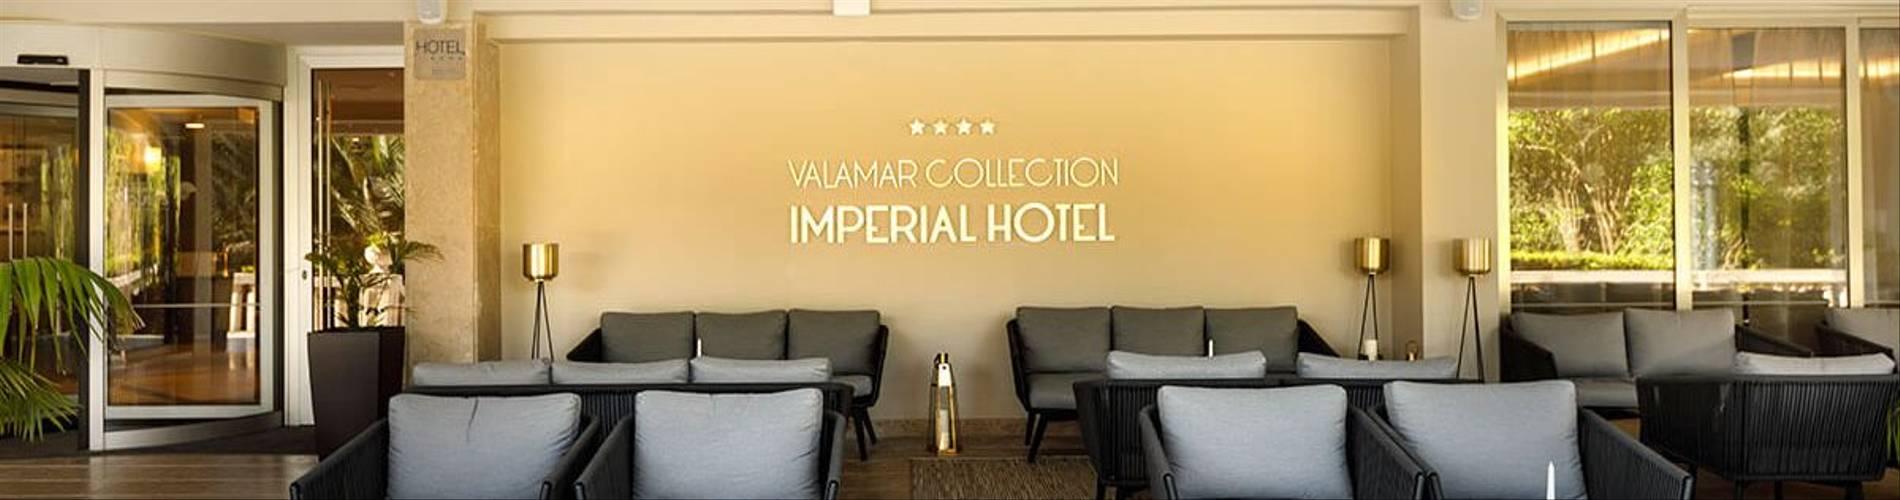 valamar-imperial-hotel-entrance.jpg